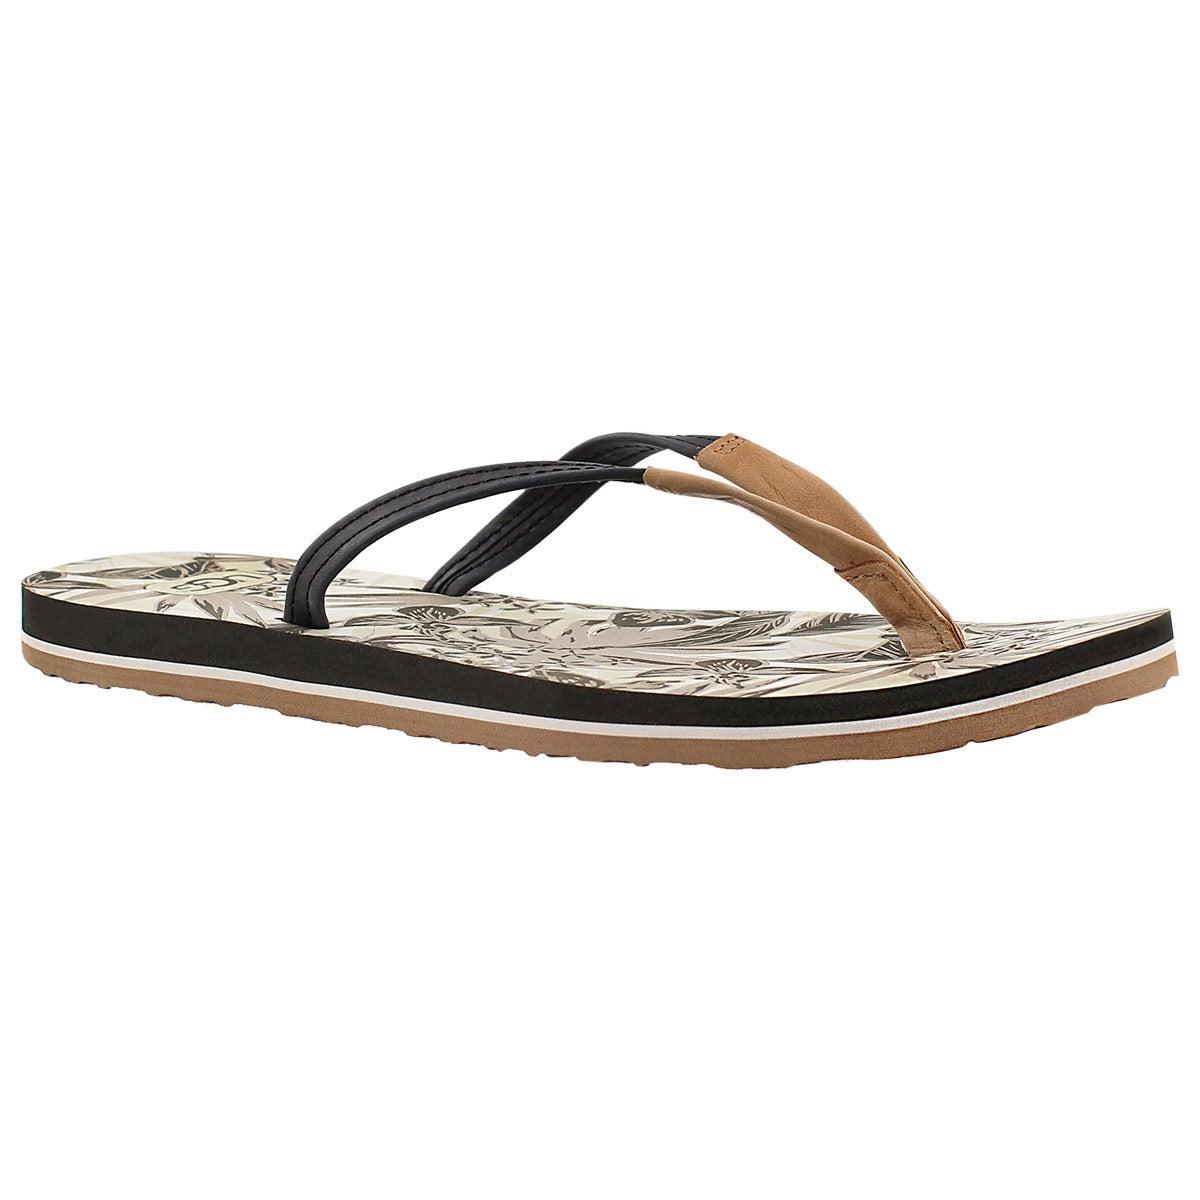 Women's MAGNOLIA ISLAND FLORAL black flip flops